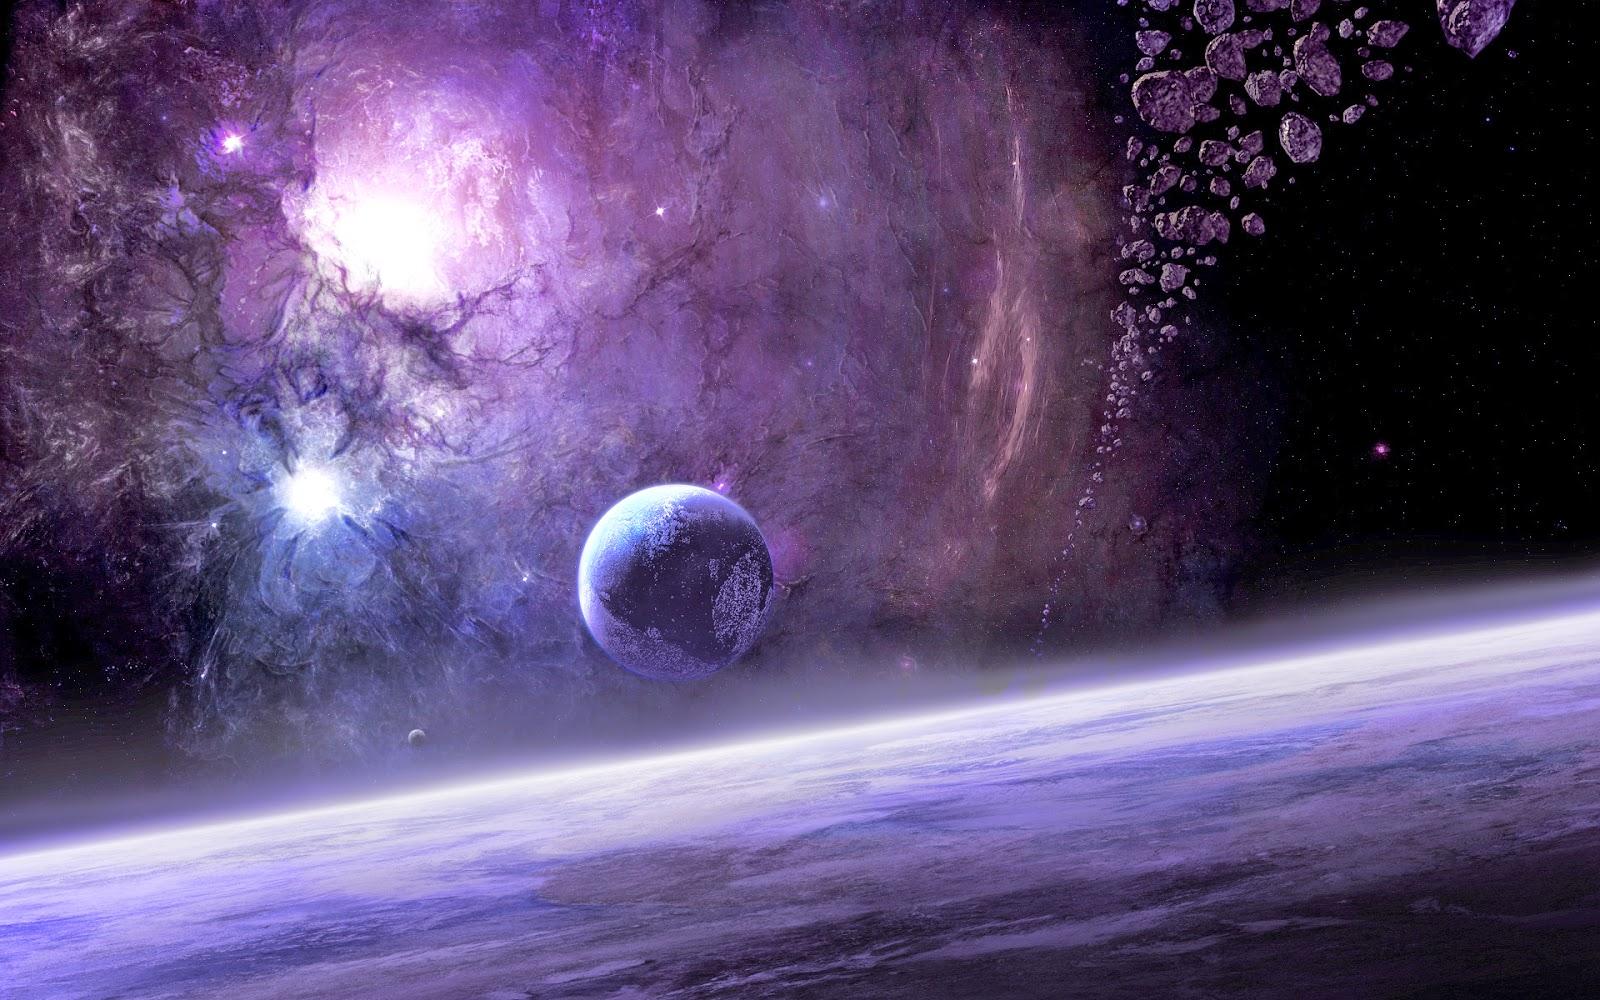 fantasy-earth-outer-spac-HD-wallpaper.jpg